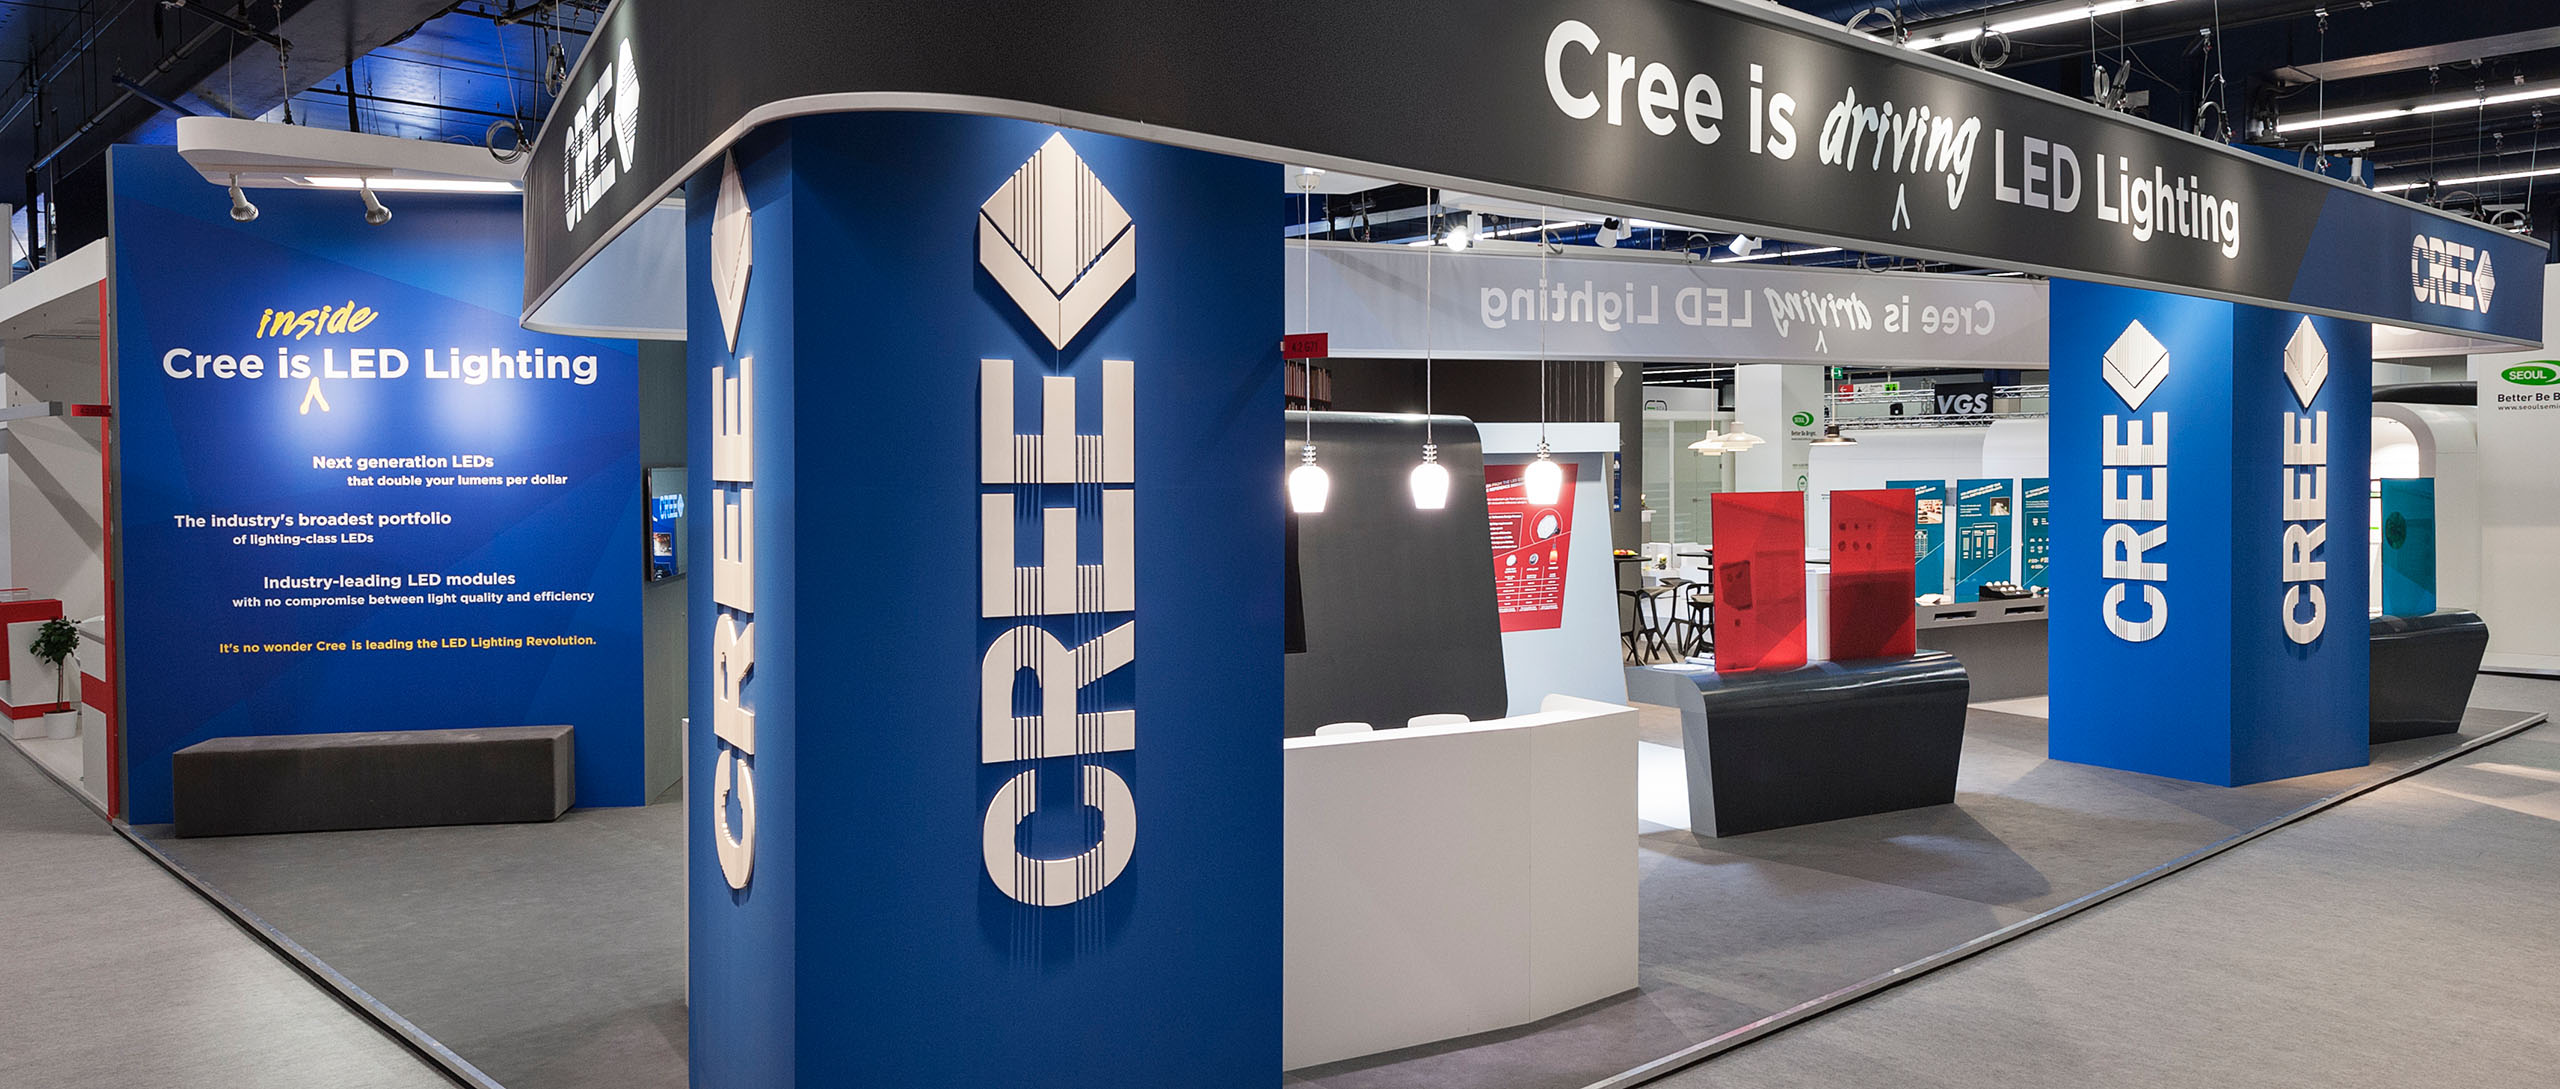 Cree Picture